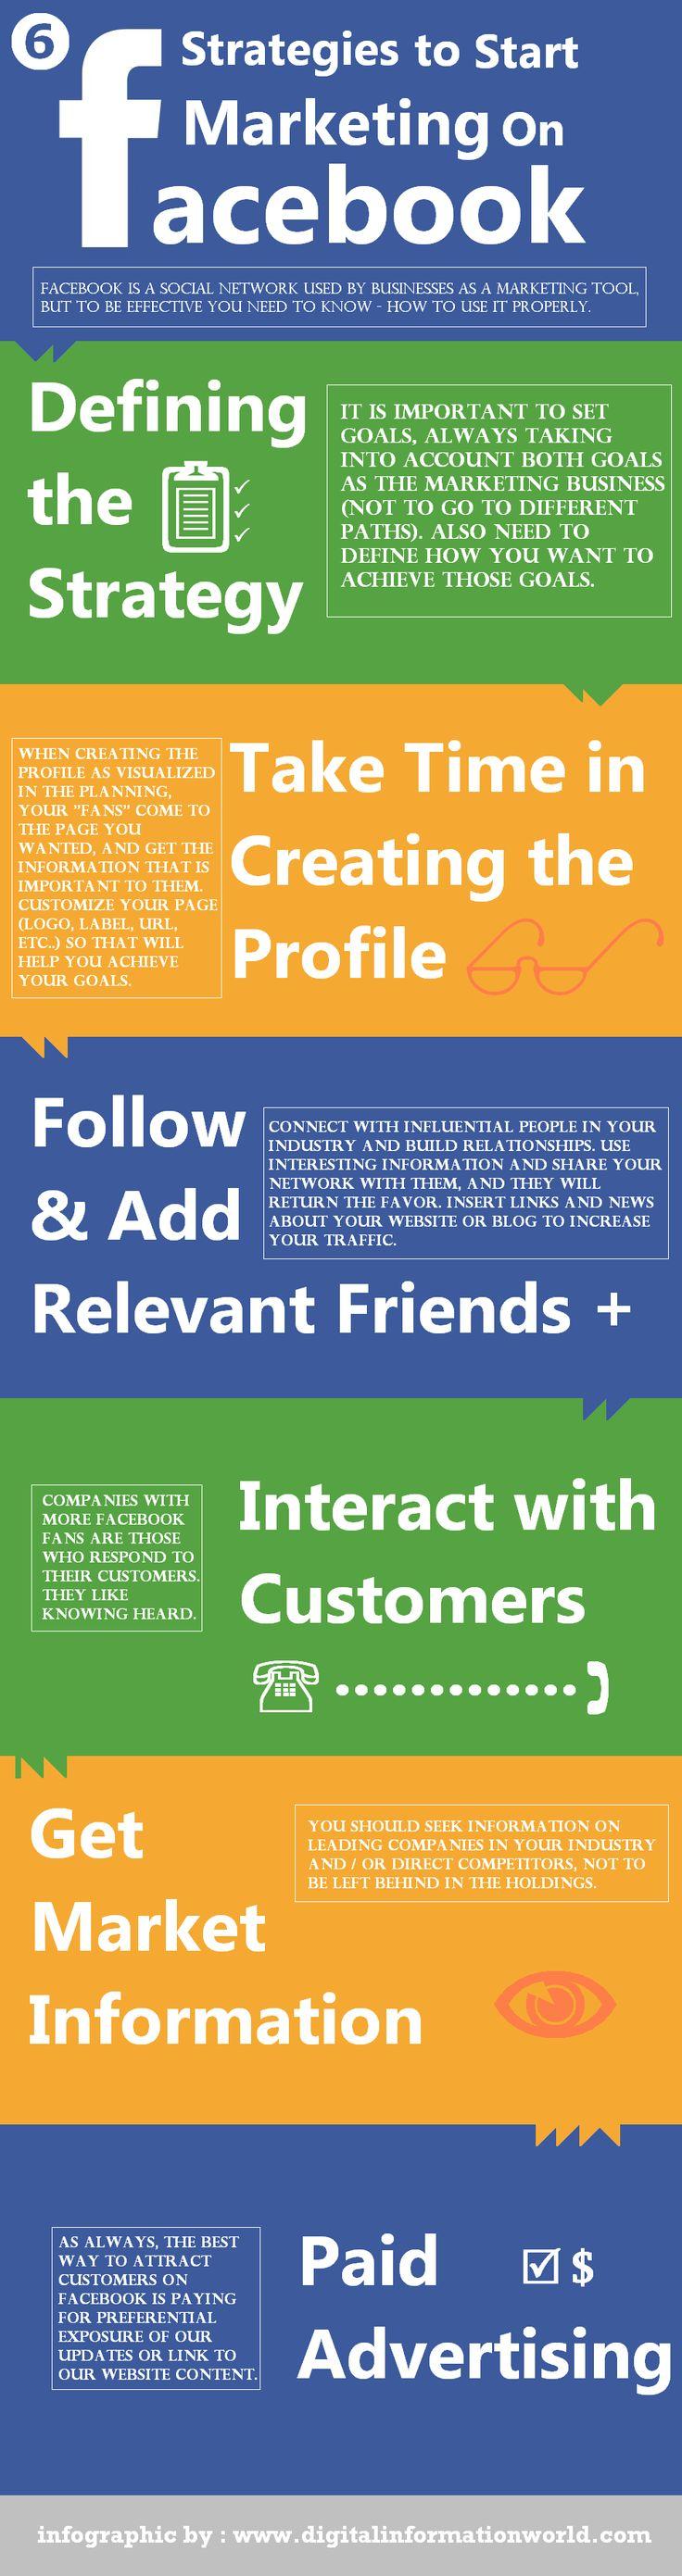 6 Fundamental Facebook Marketing Strategies #infographic